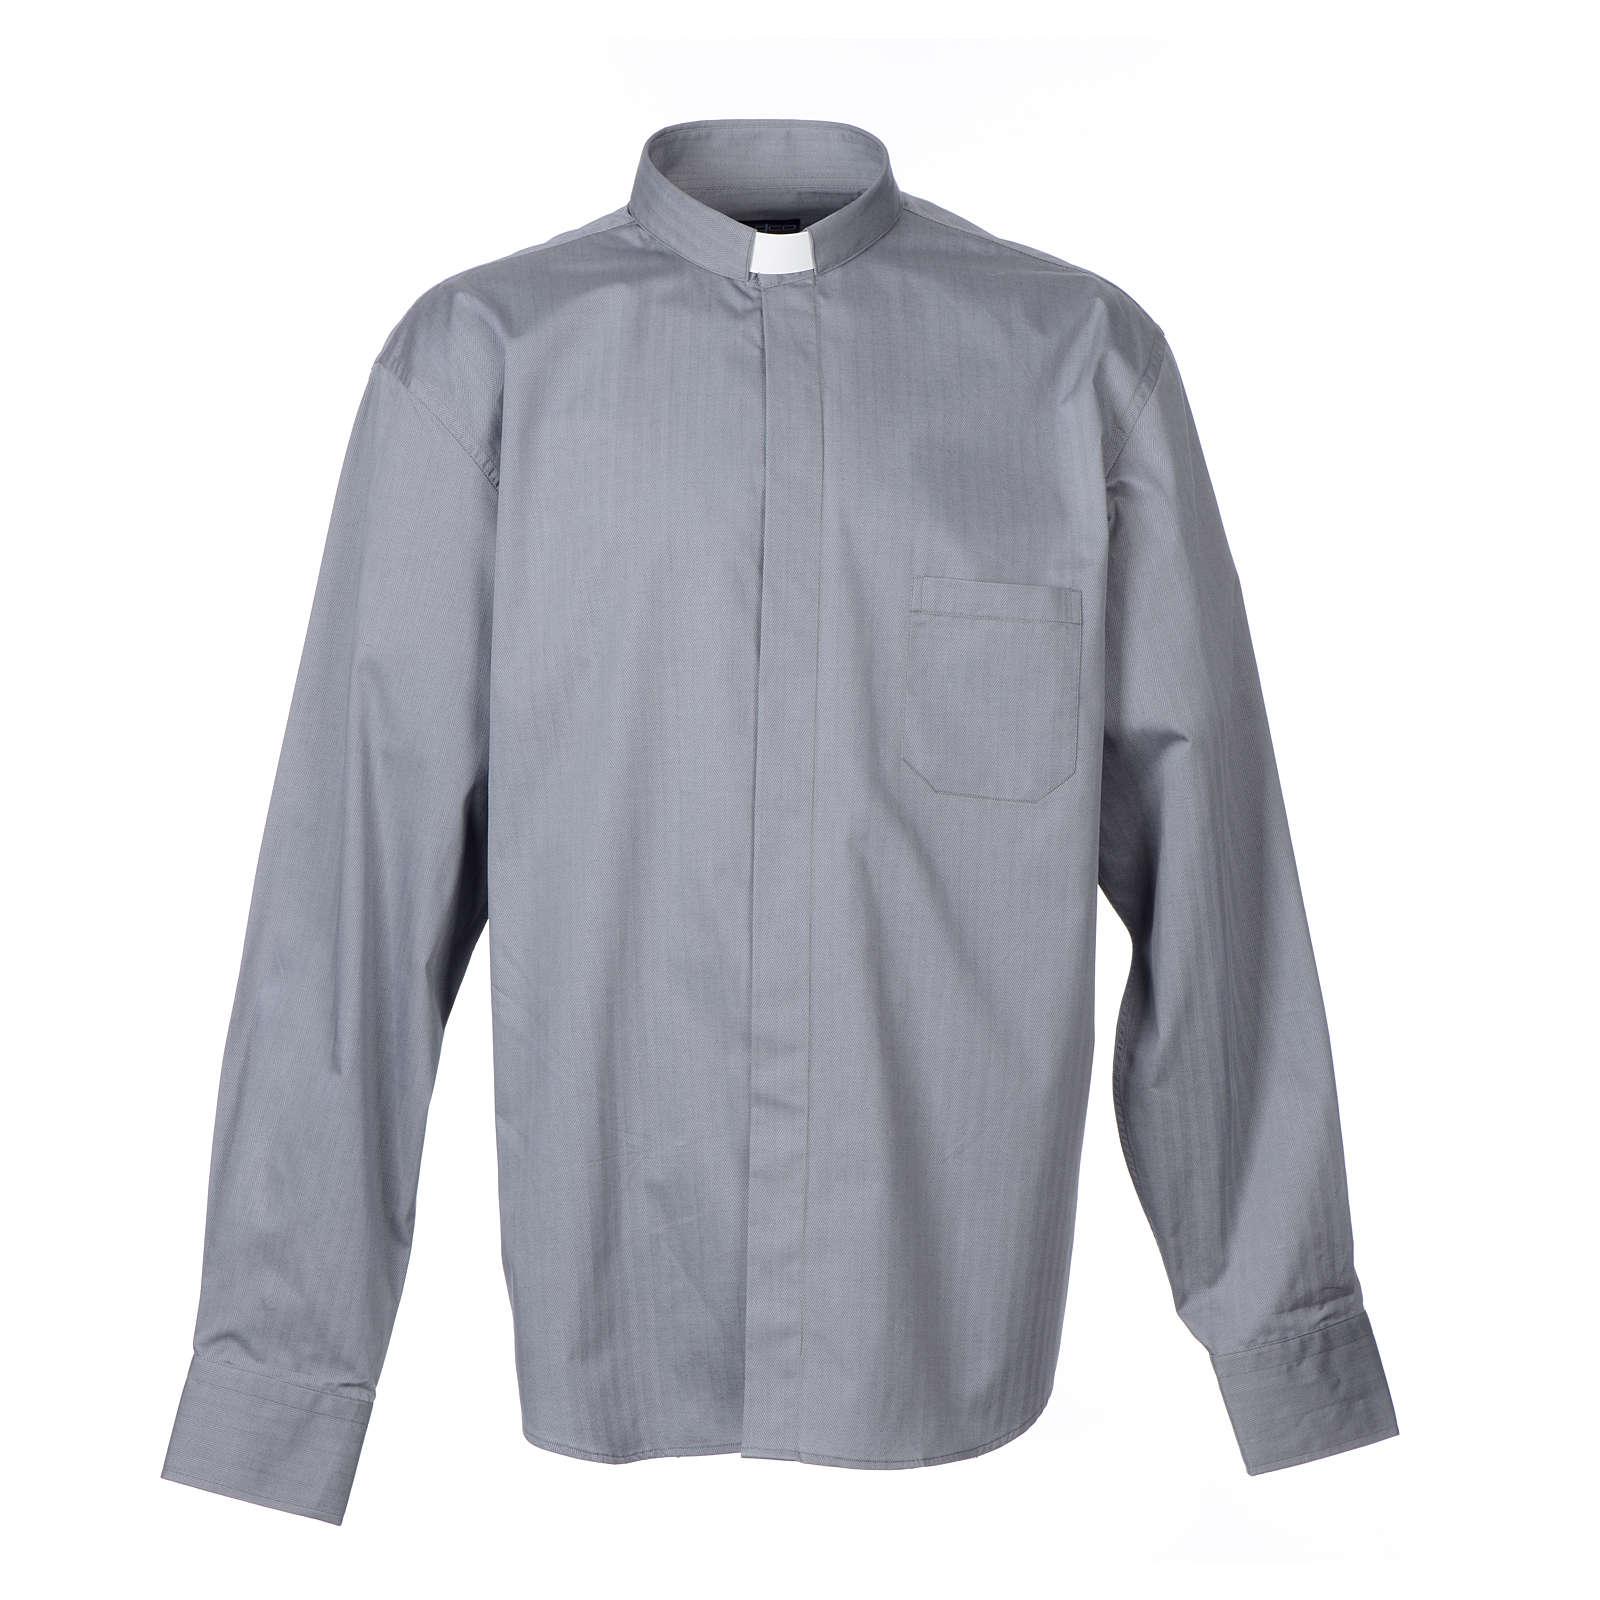 Clergy shirt Long sleeves easy-iron mixed herringbone cotton Grey 4